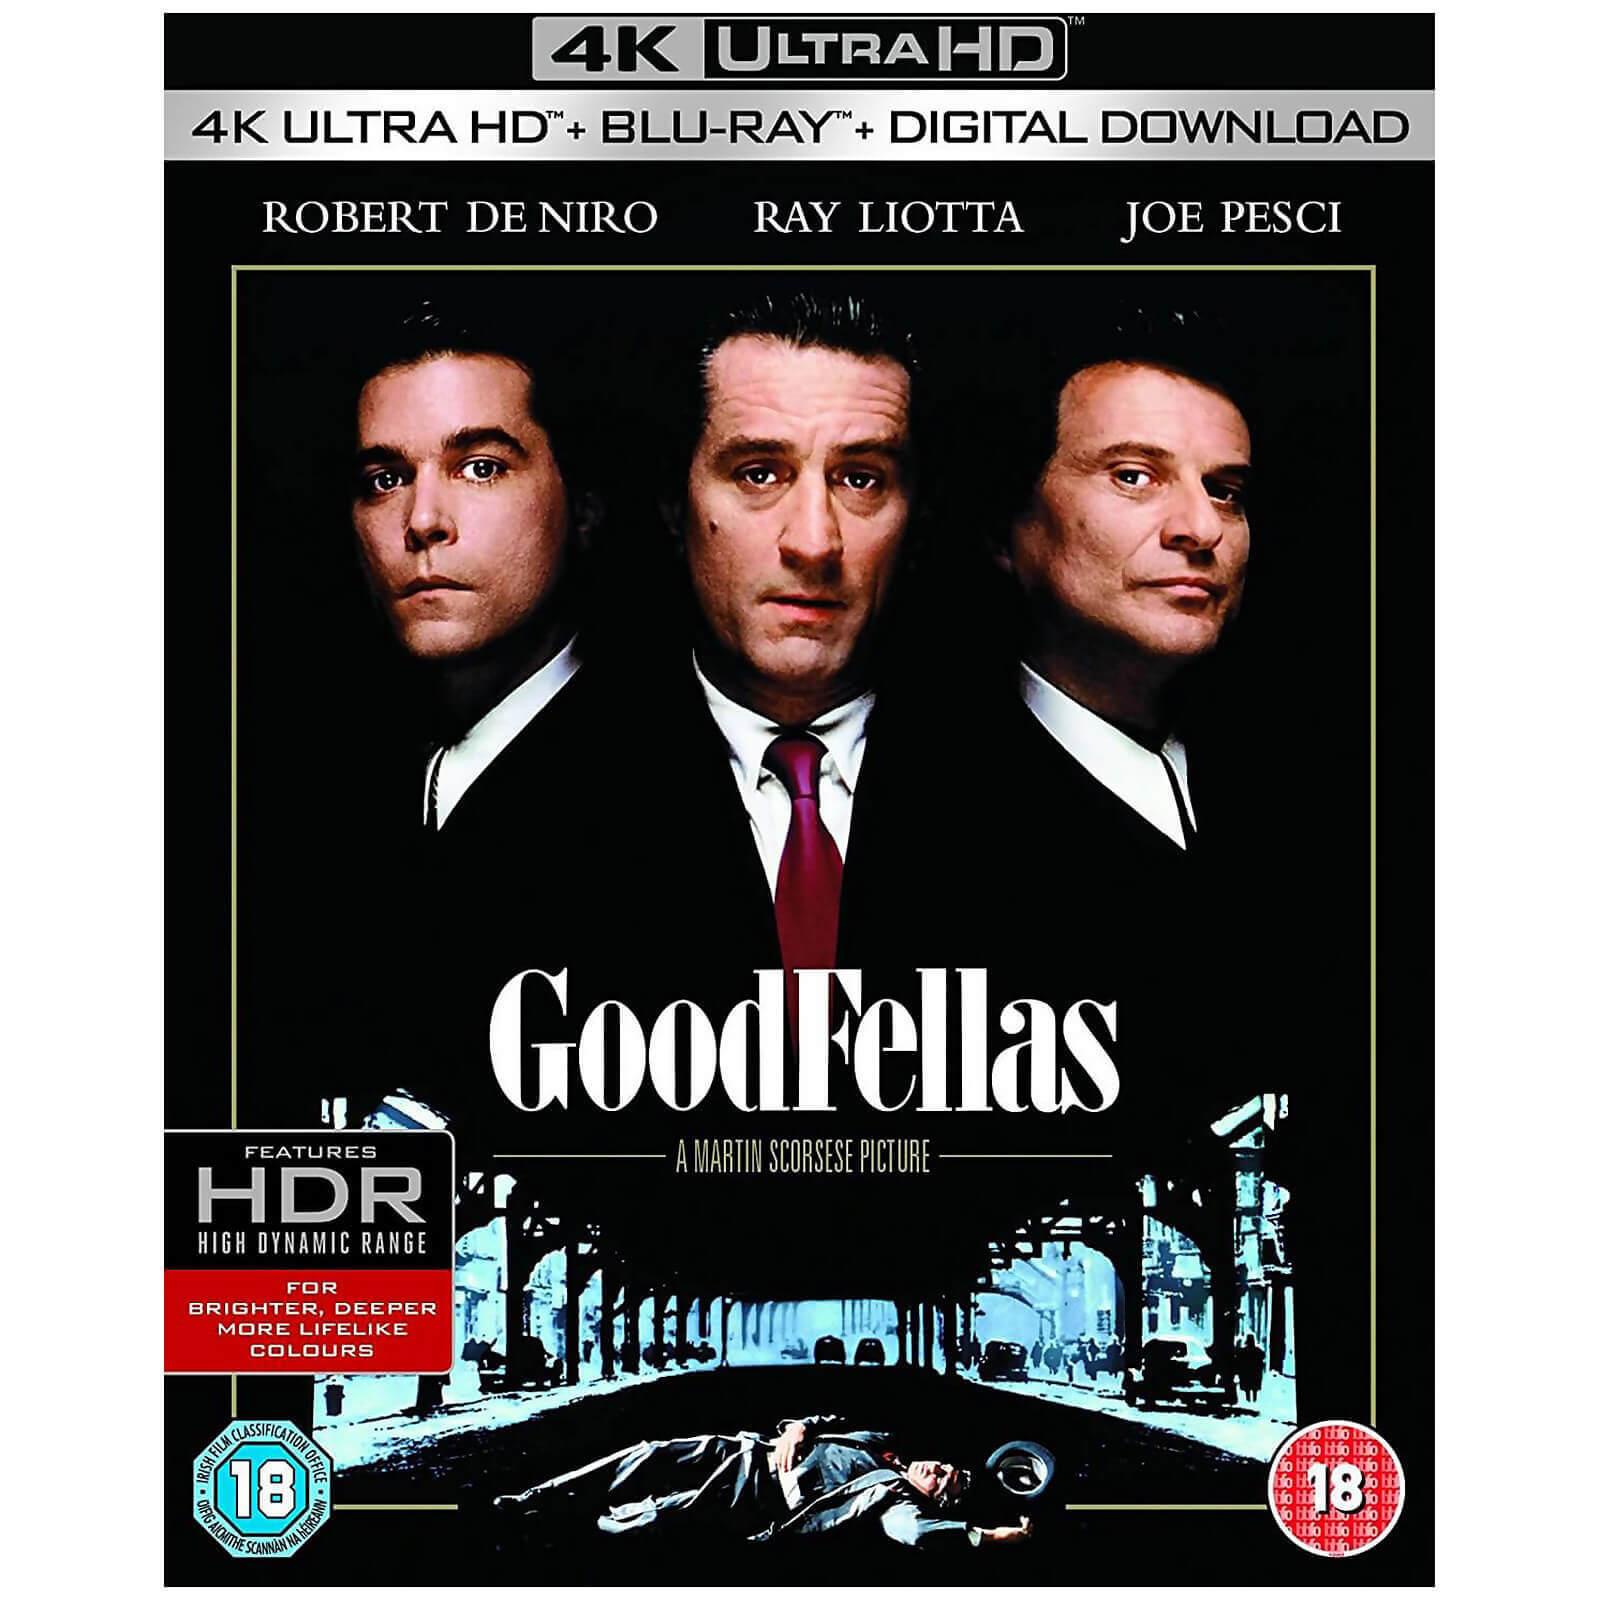 Goodfellas - 4K Ultra HD